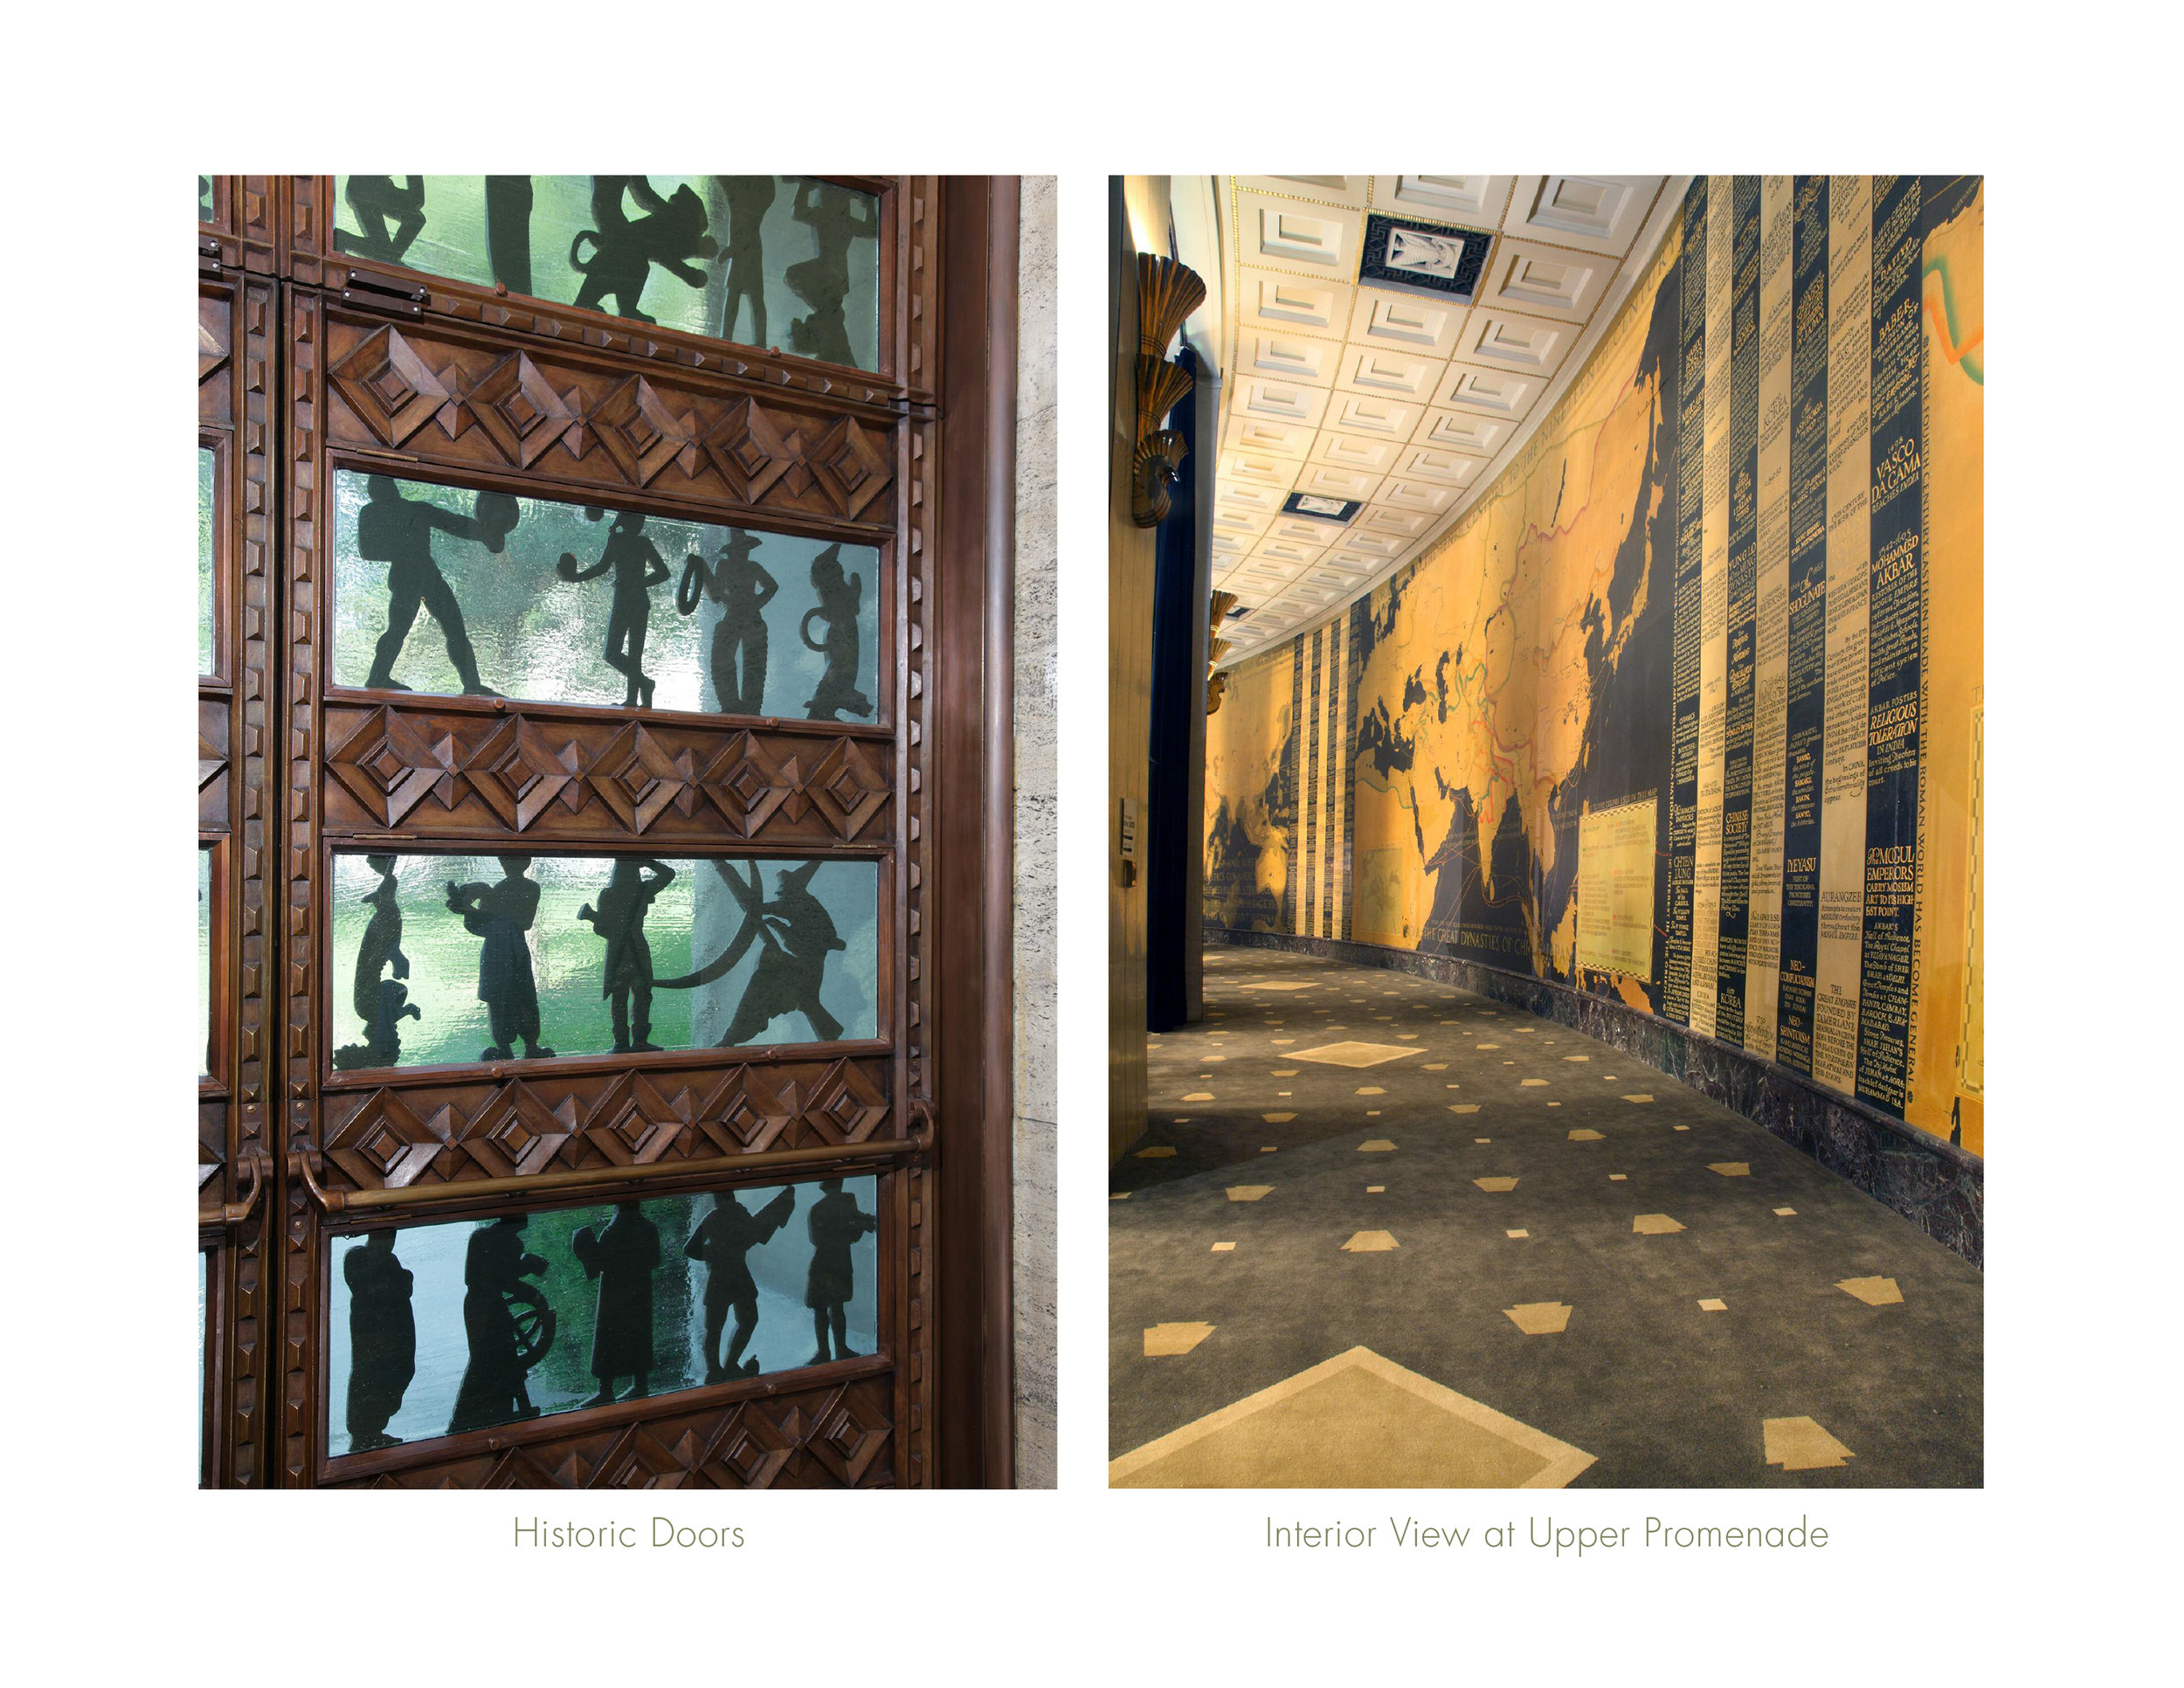 12 Historic Doors & Upper Promenade.jpg